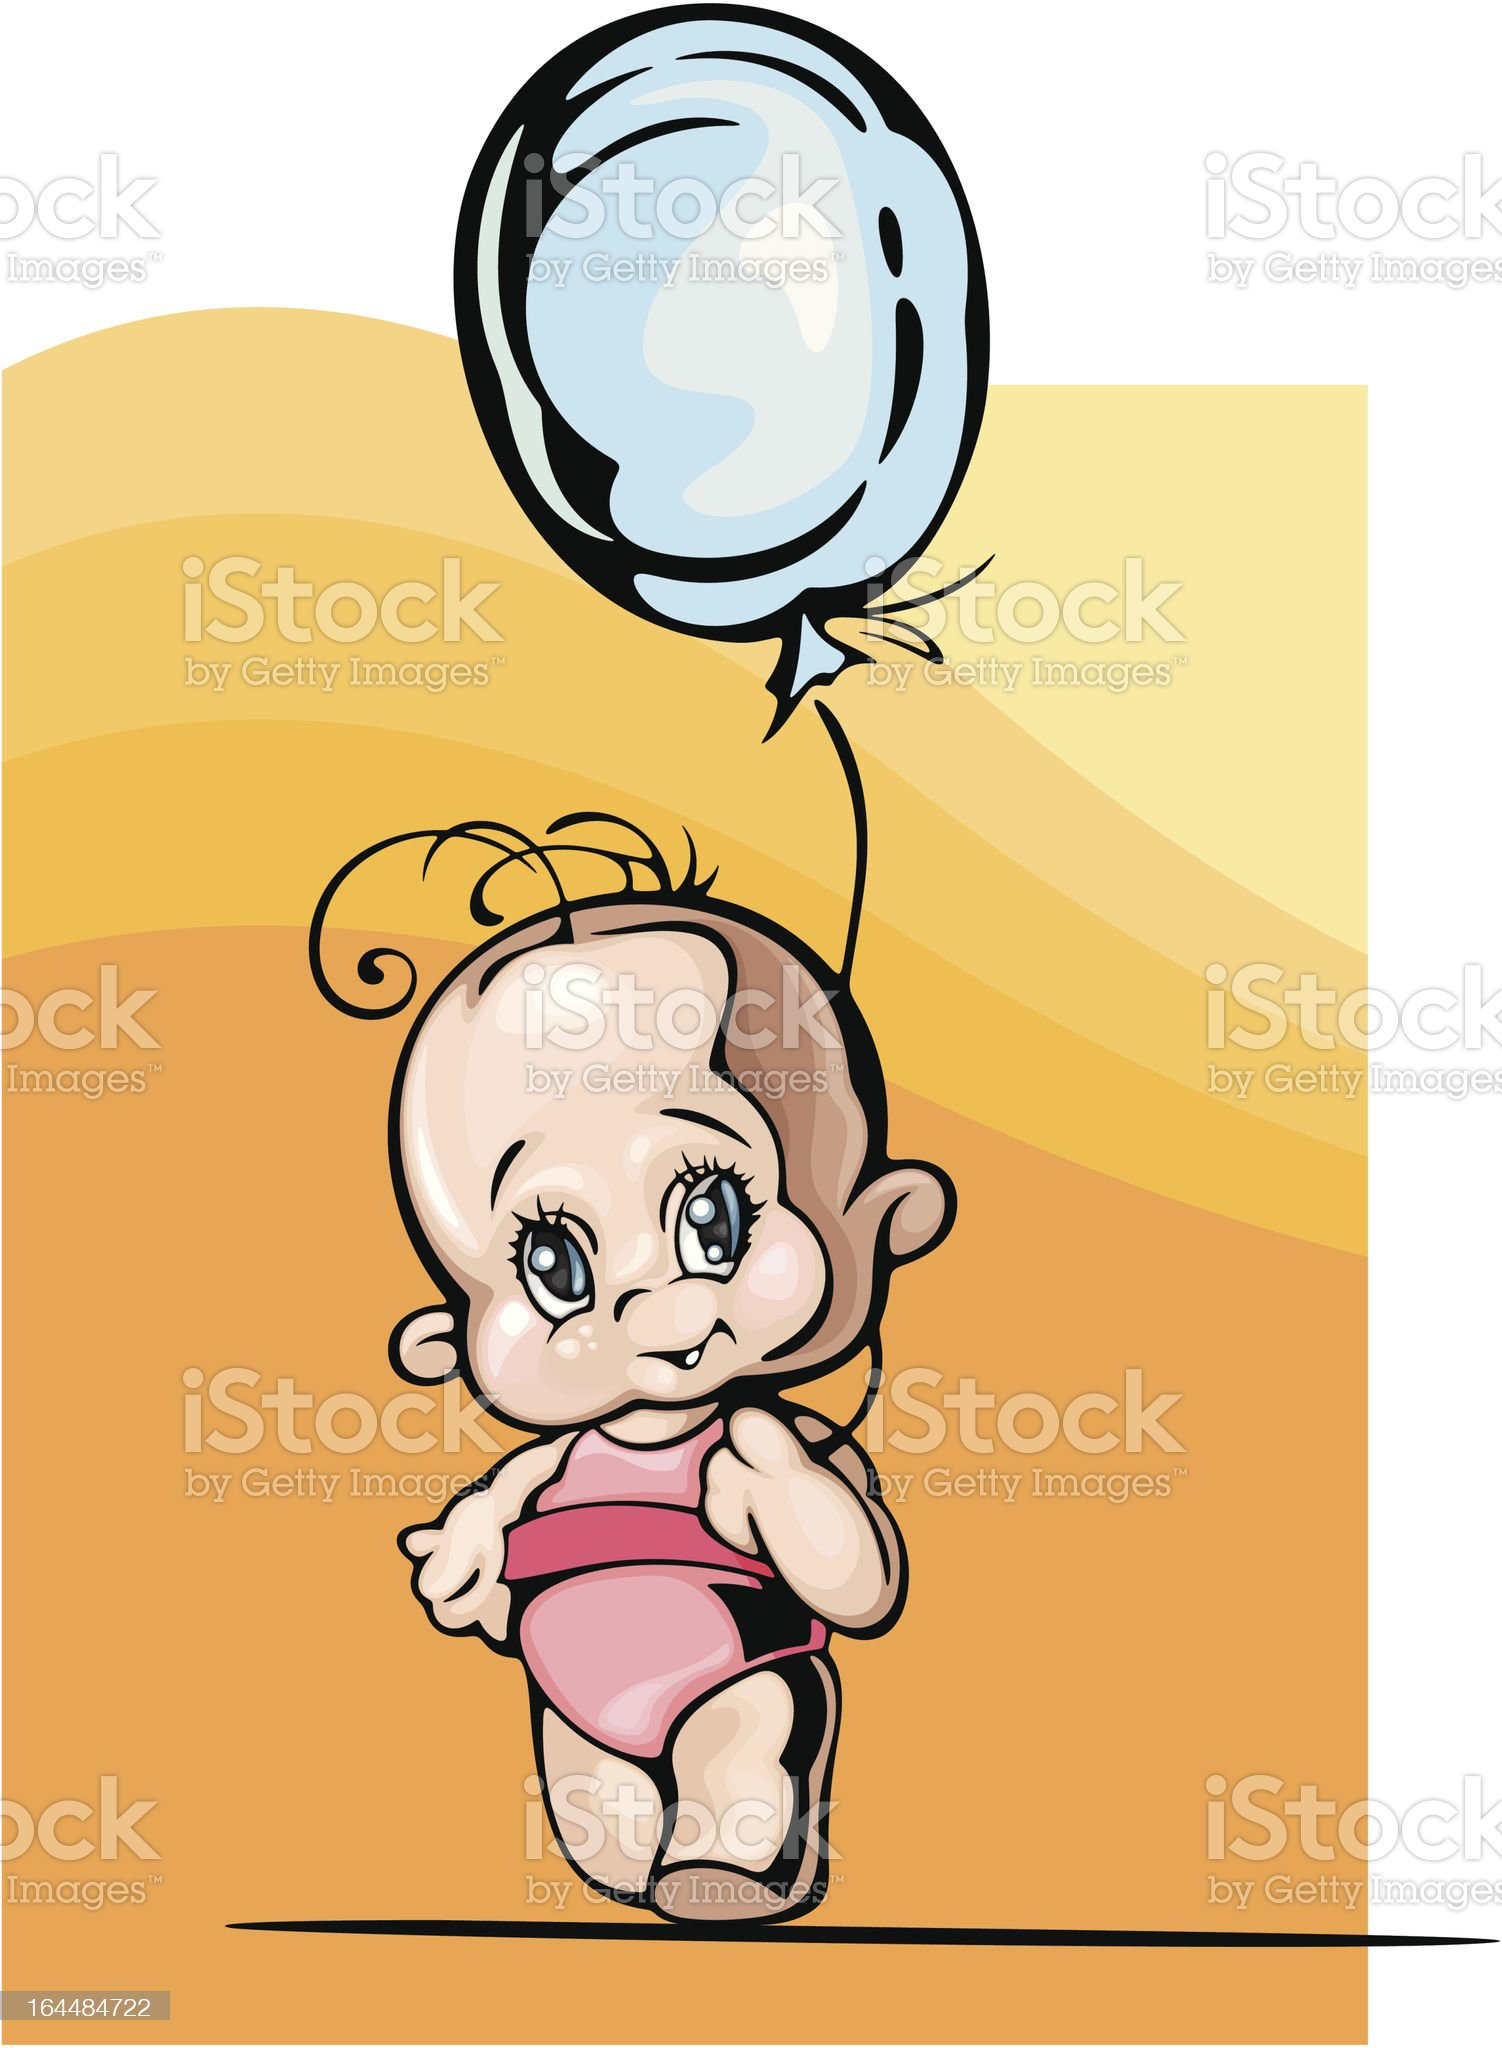 Cute Baby Girl Vector Illustration royalty-free stock vector art